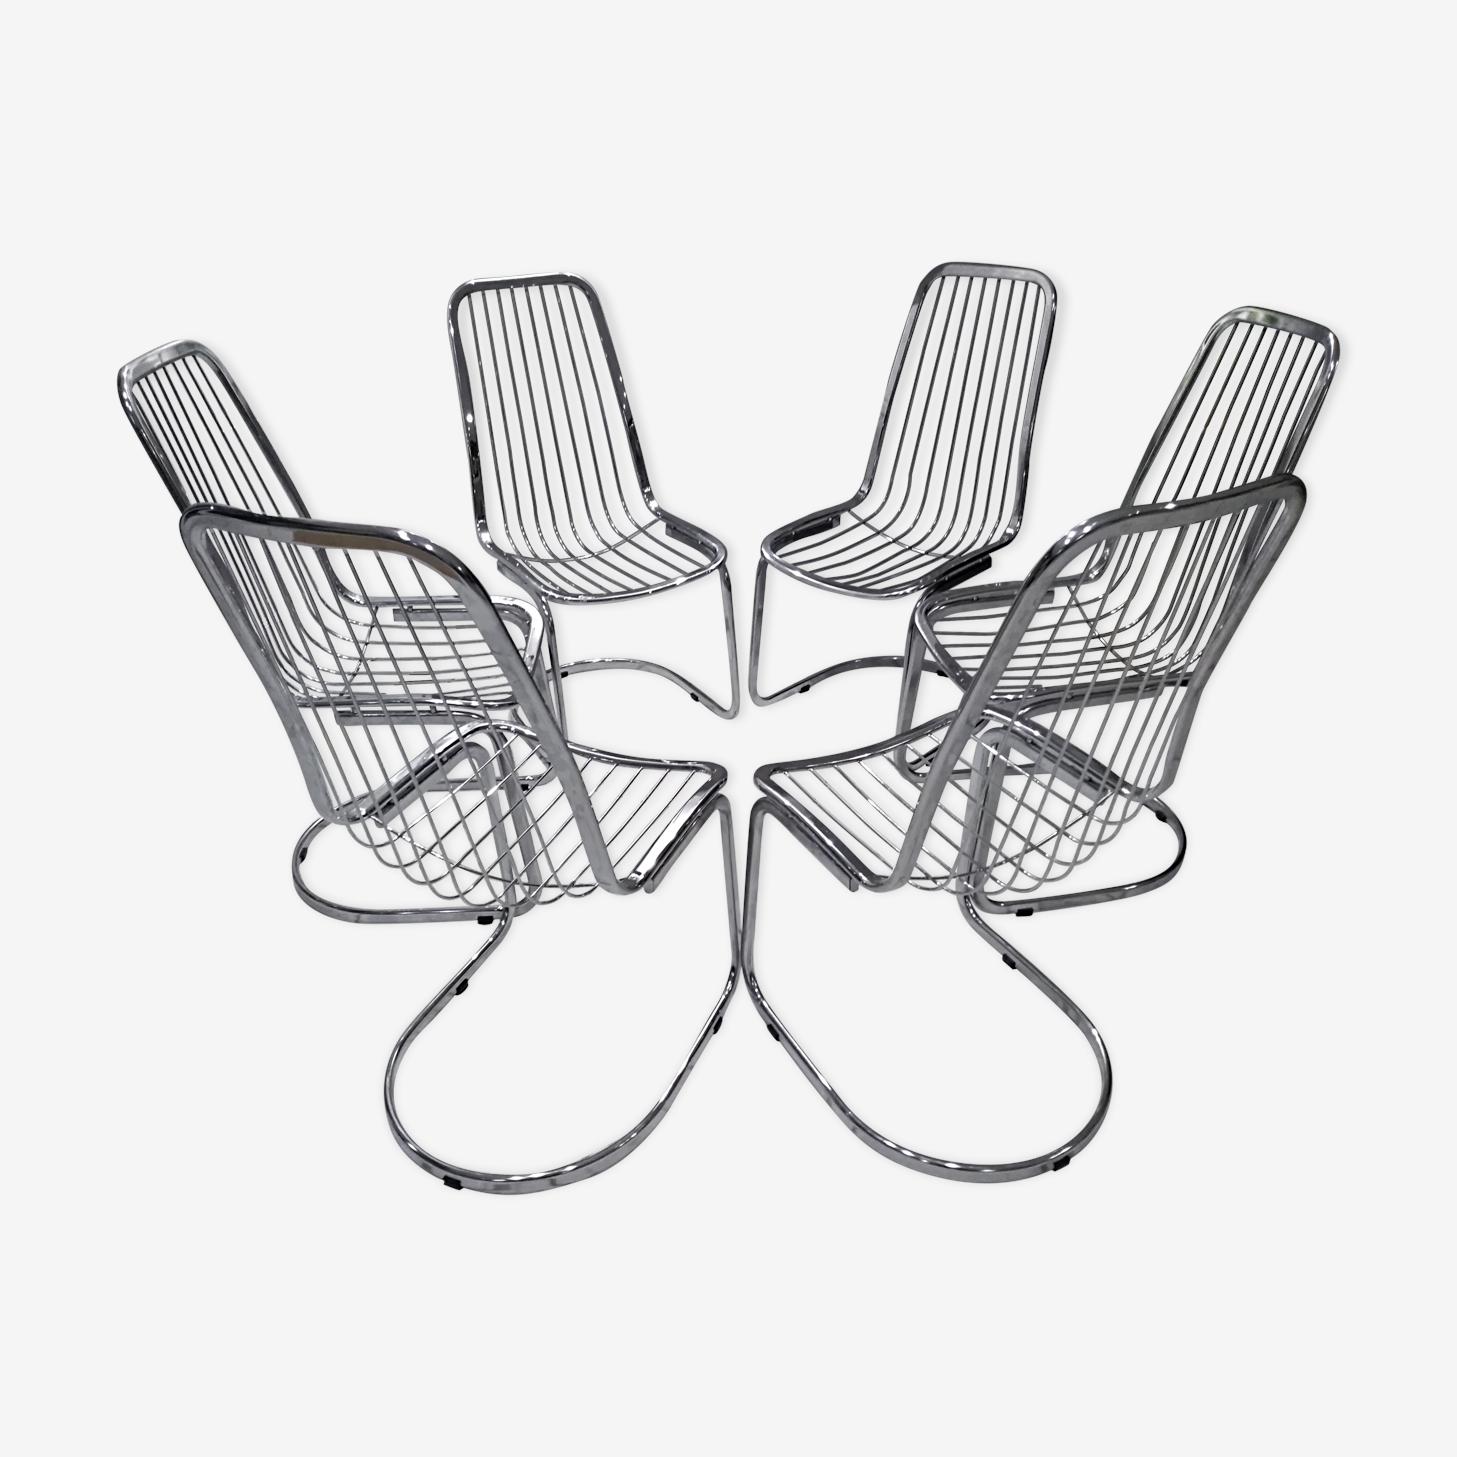 Set of 6 chairs design vintage 1970